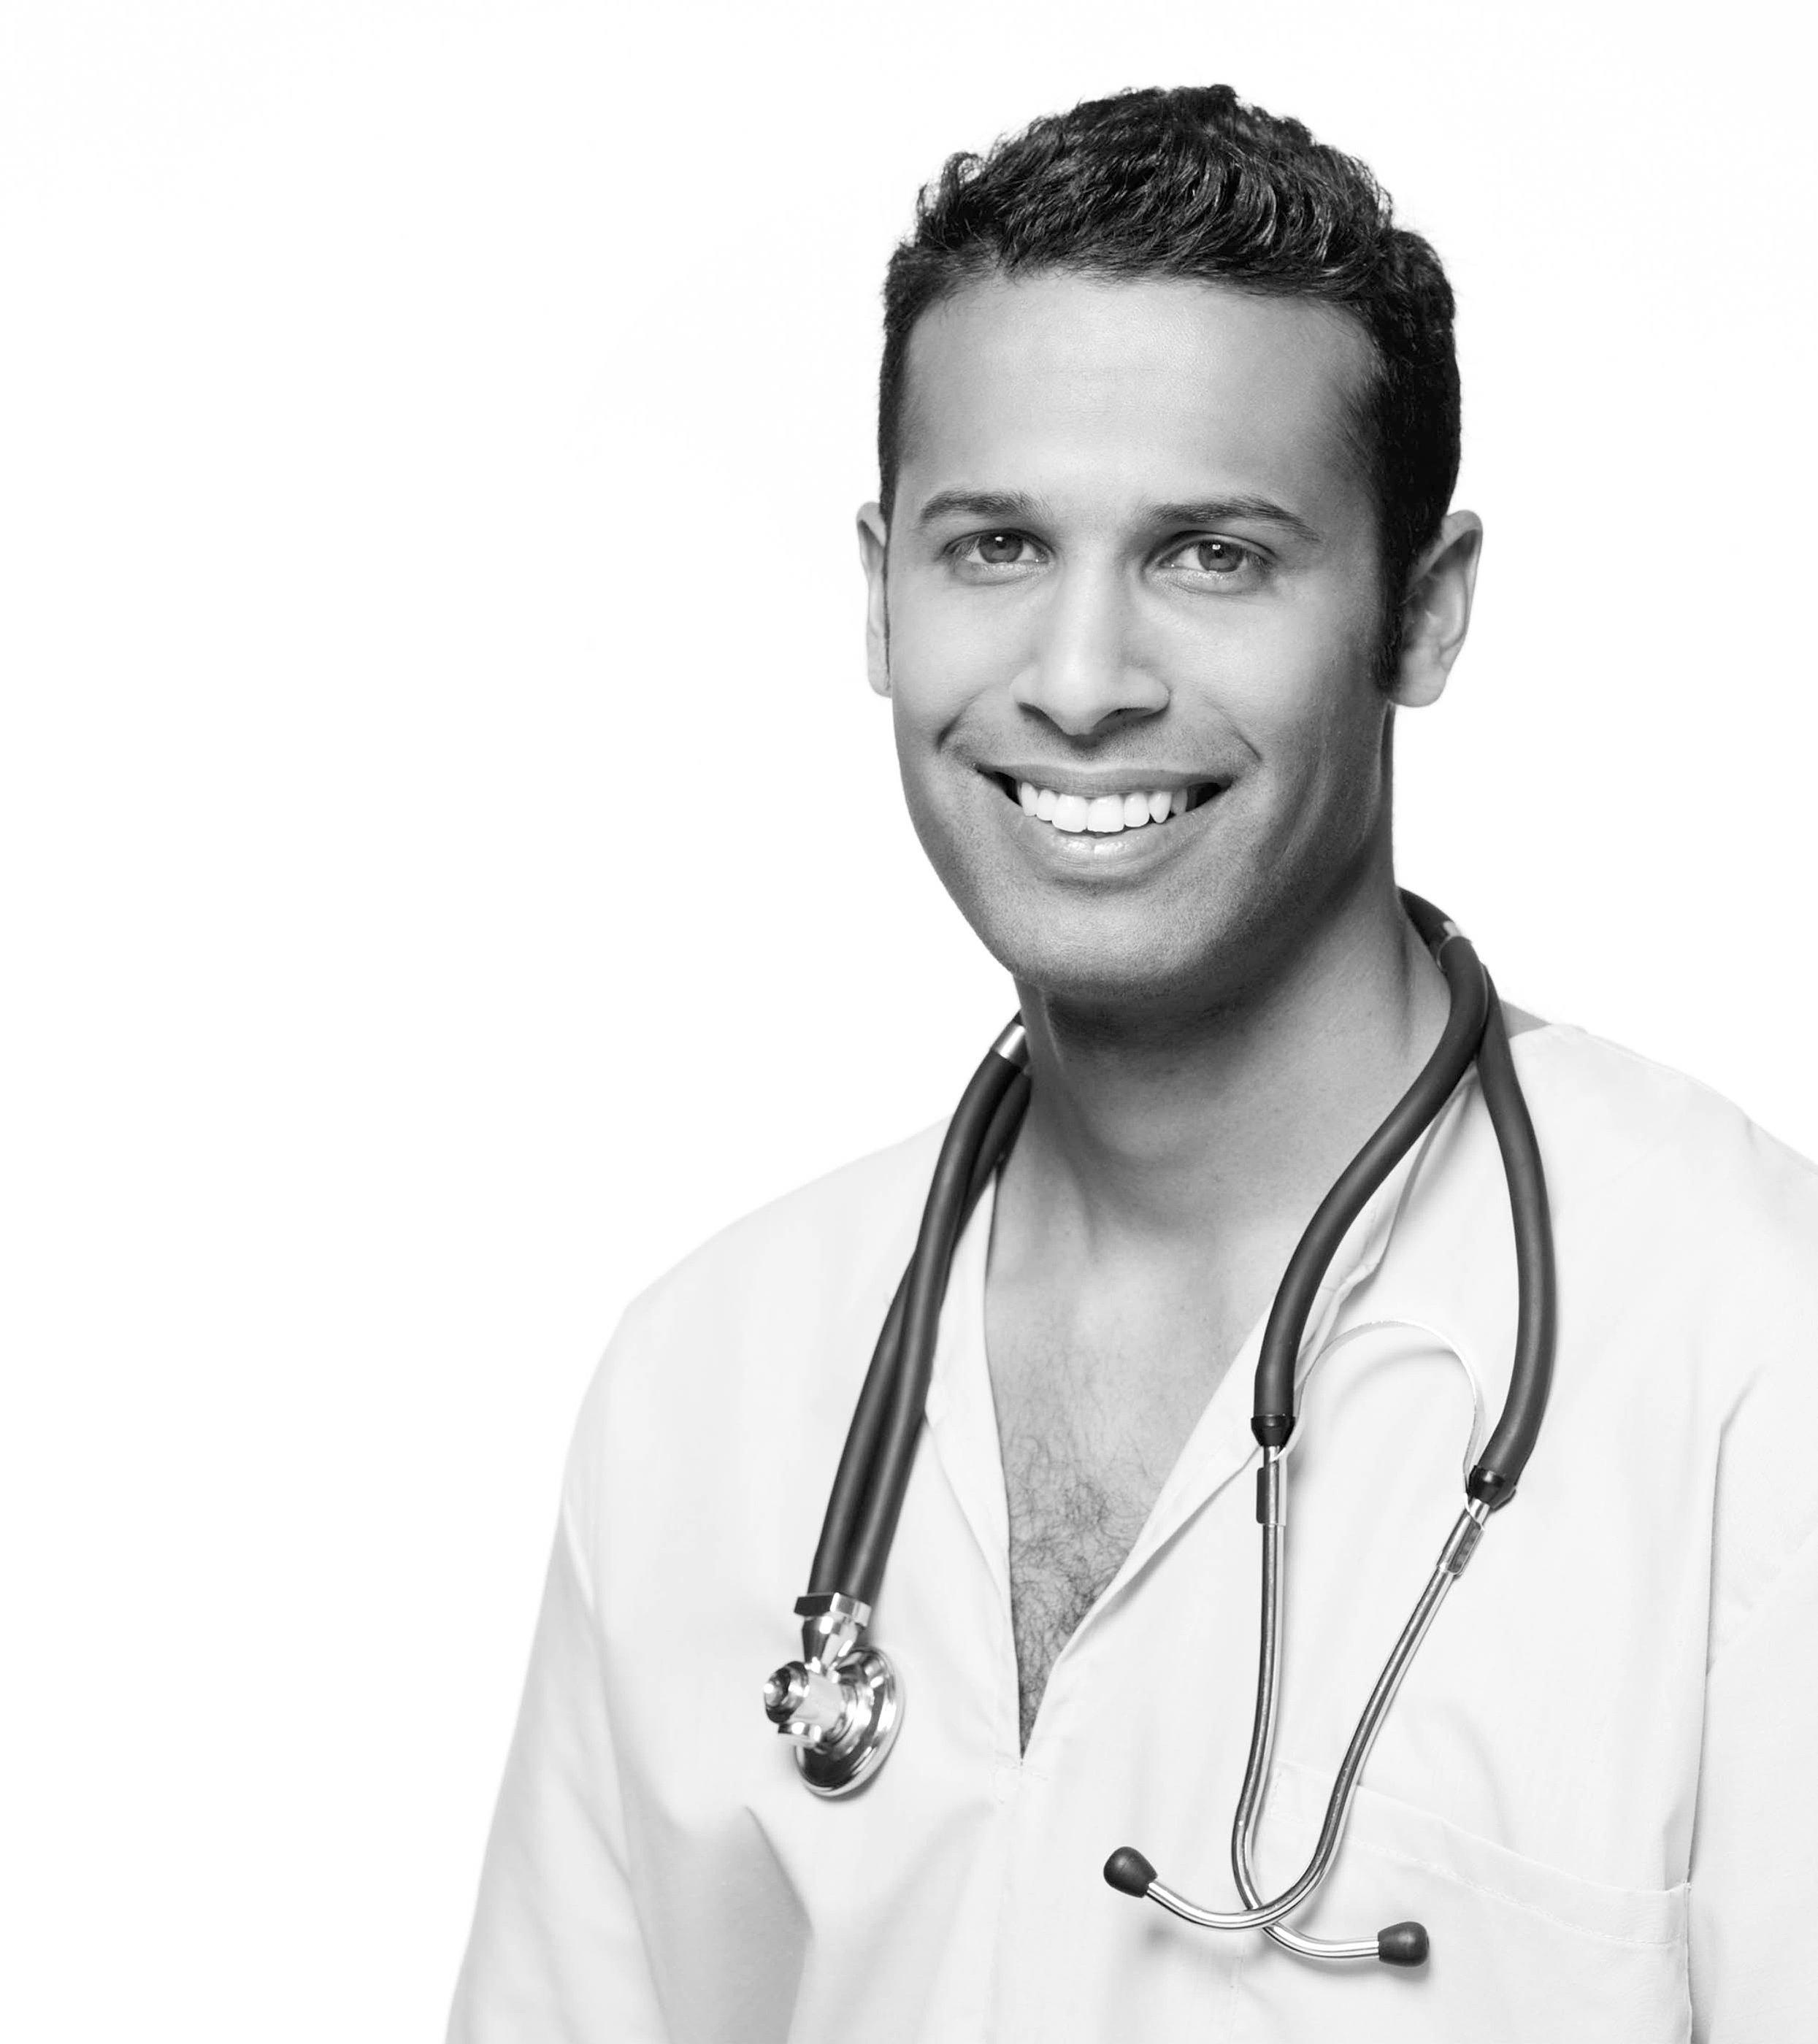 professional cv linkedin profile writer job hunting coach medical